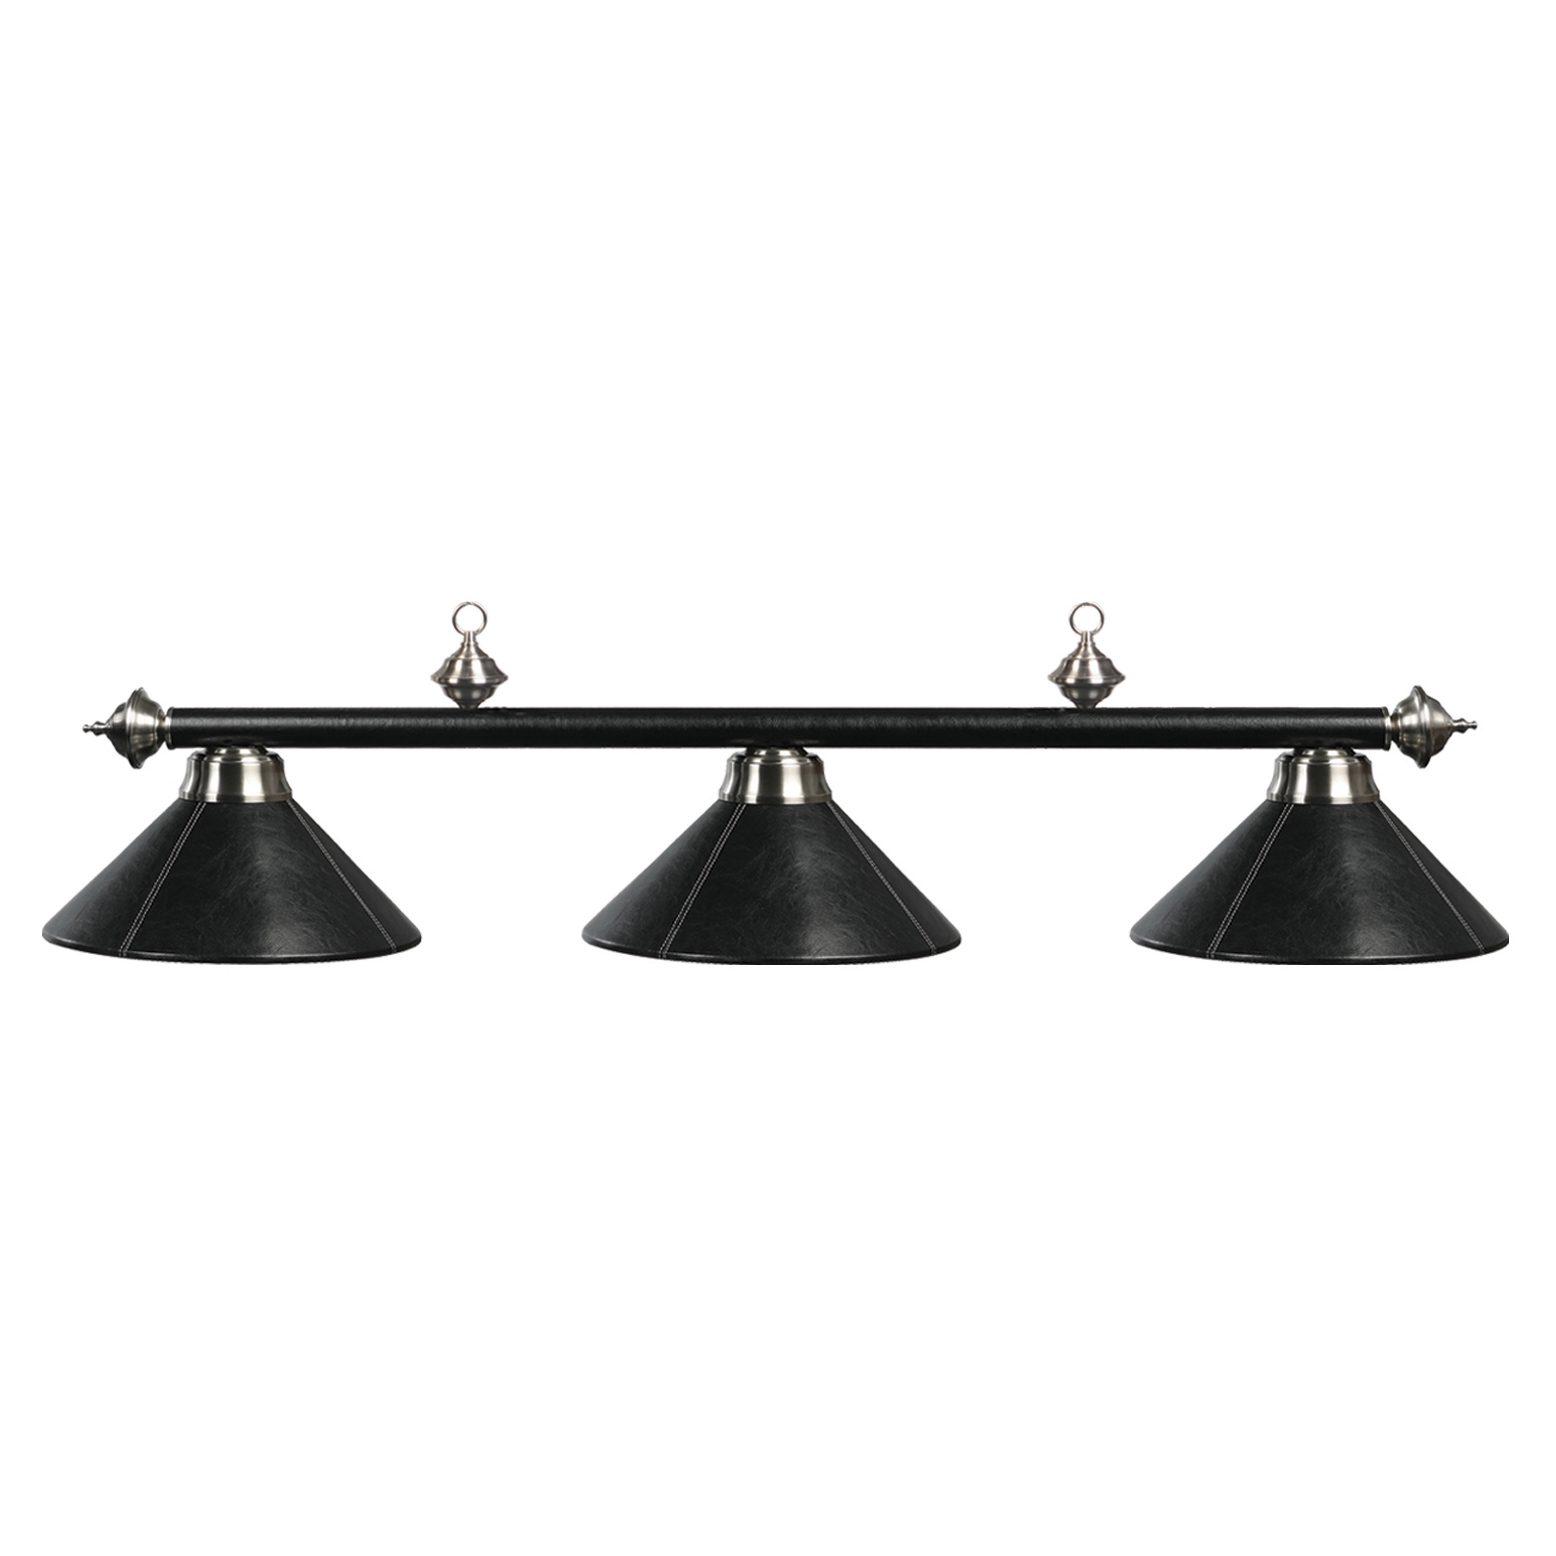 3 Shade 54 Quot Billiard Light Black Leather Ram Game Room